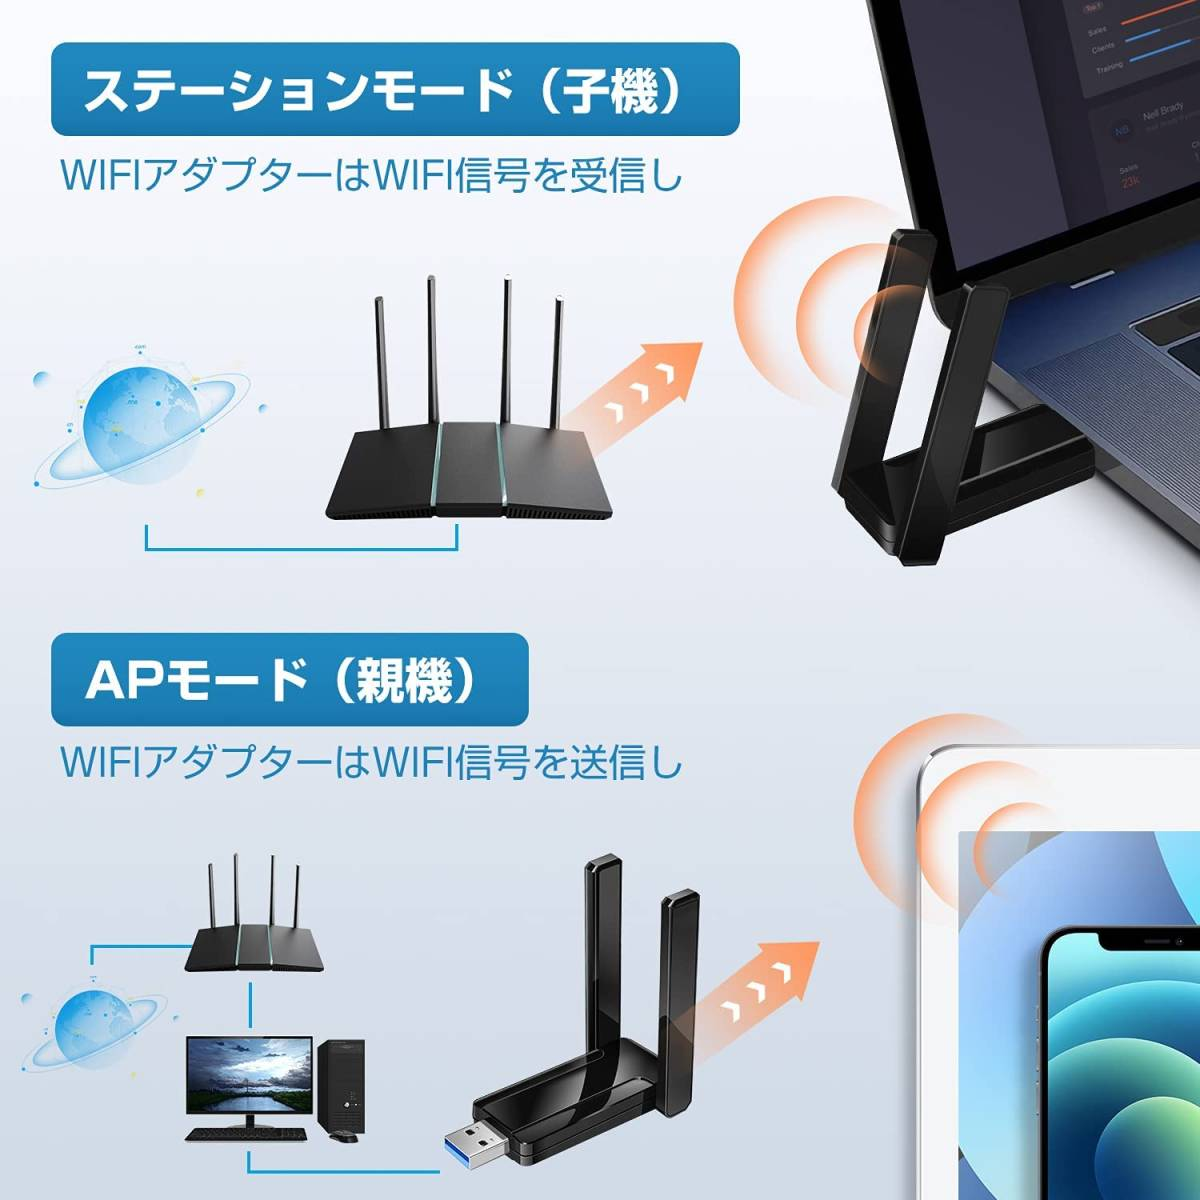 WiFi 無線LAN 子機 1300Mbps wifi アダプタ 2.4G/5G デュアルバンド 5dBi高速通信